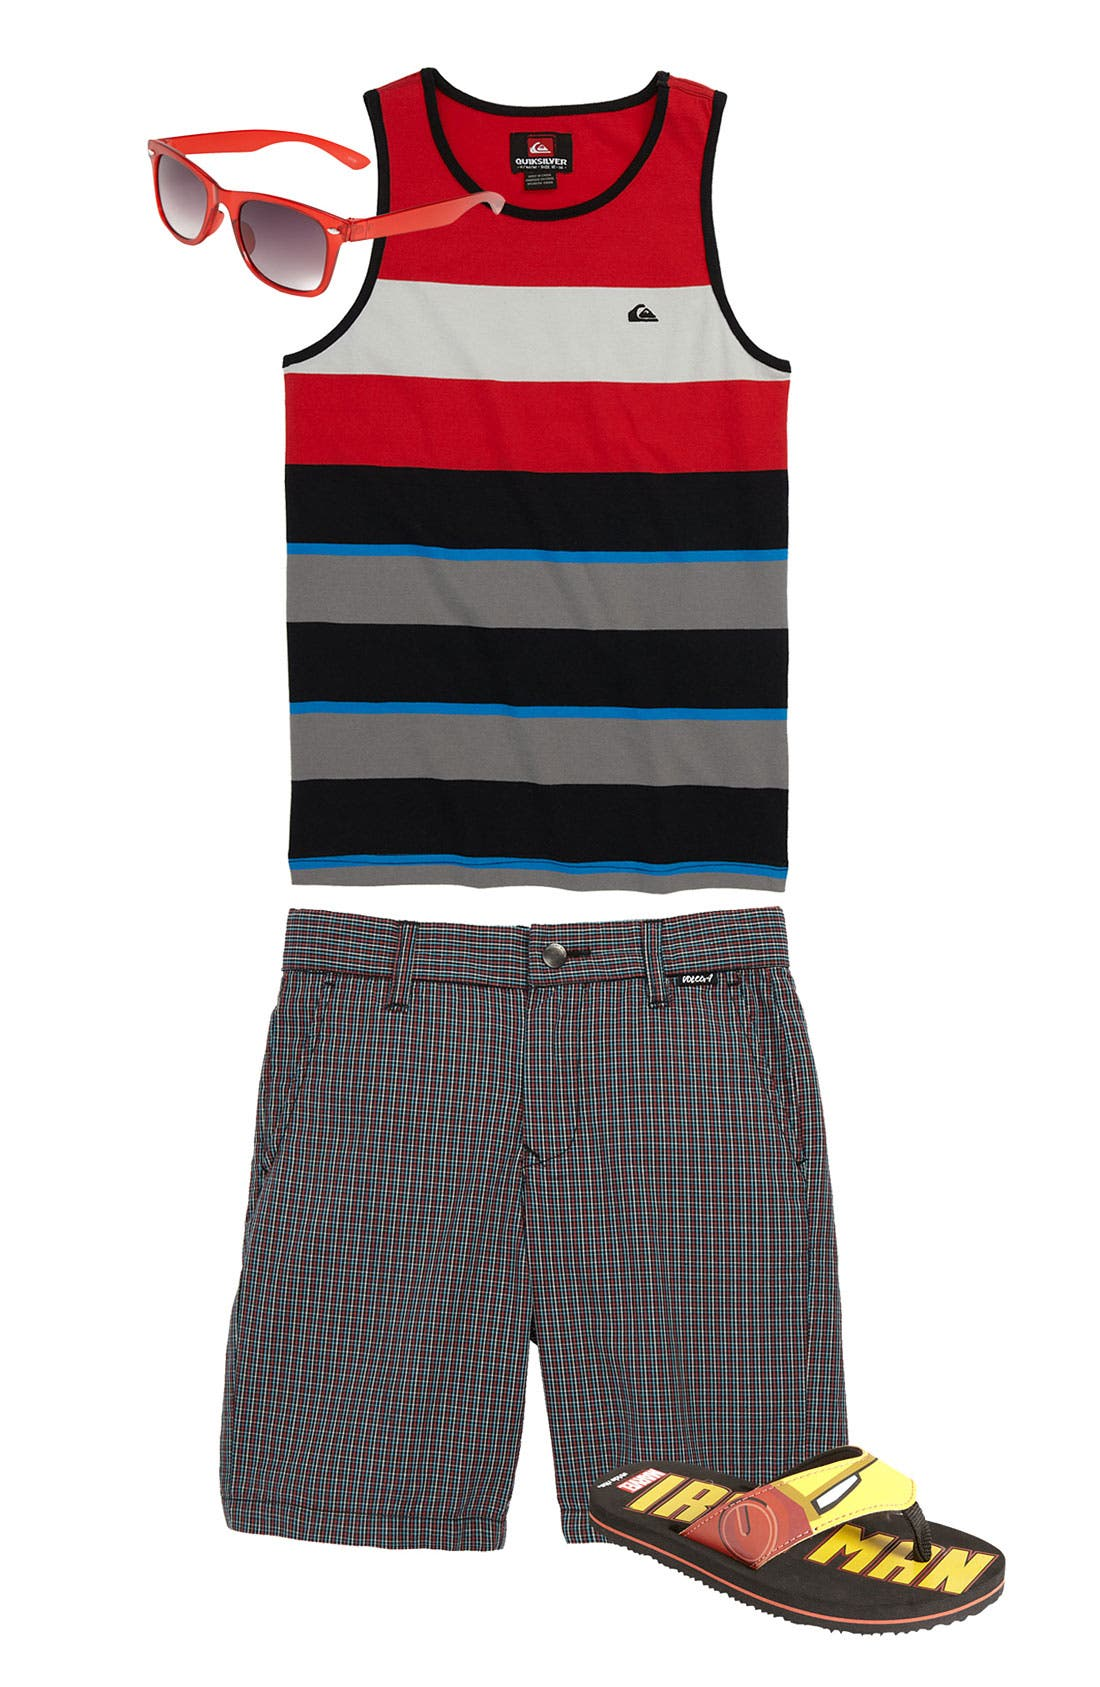 Main Image - Quiksilver Shirt, Volcom Shorts, Icon Eyewear Sunglasses (Little Boys)